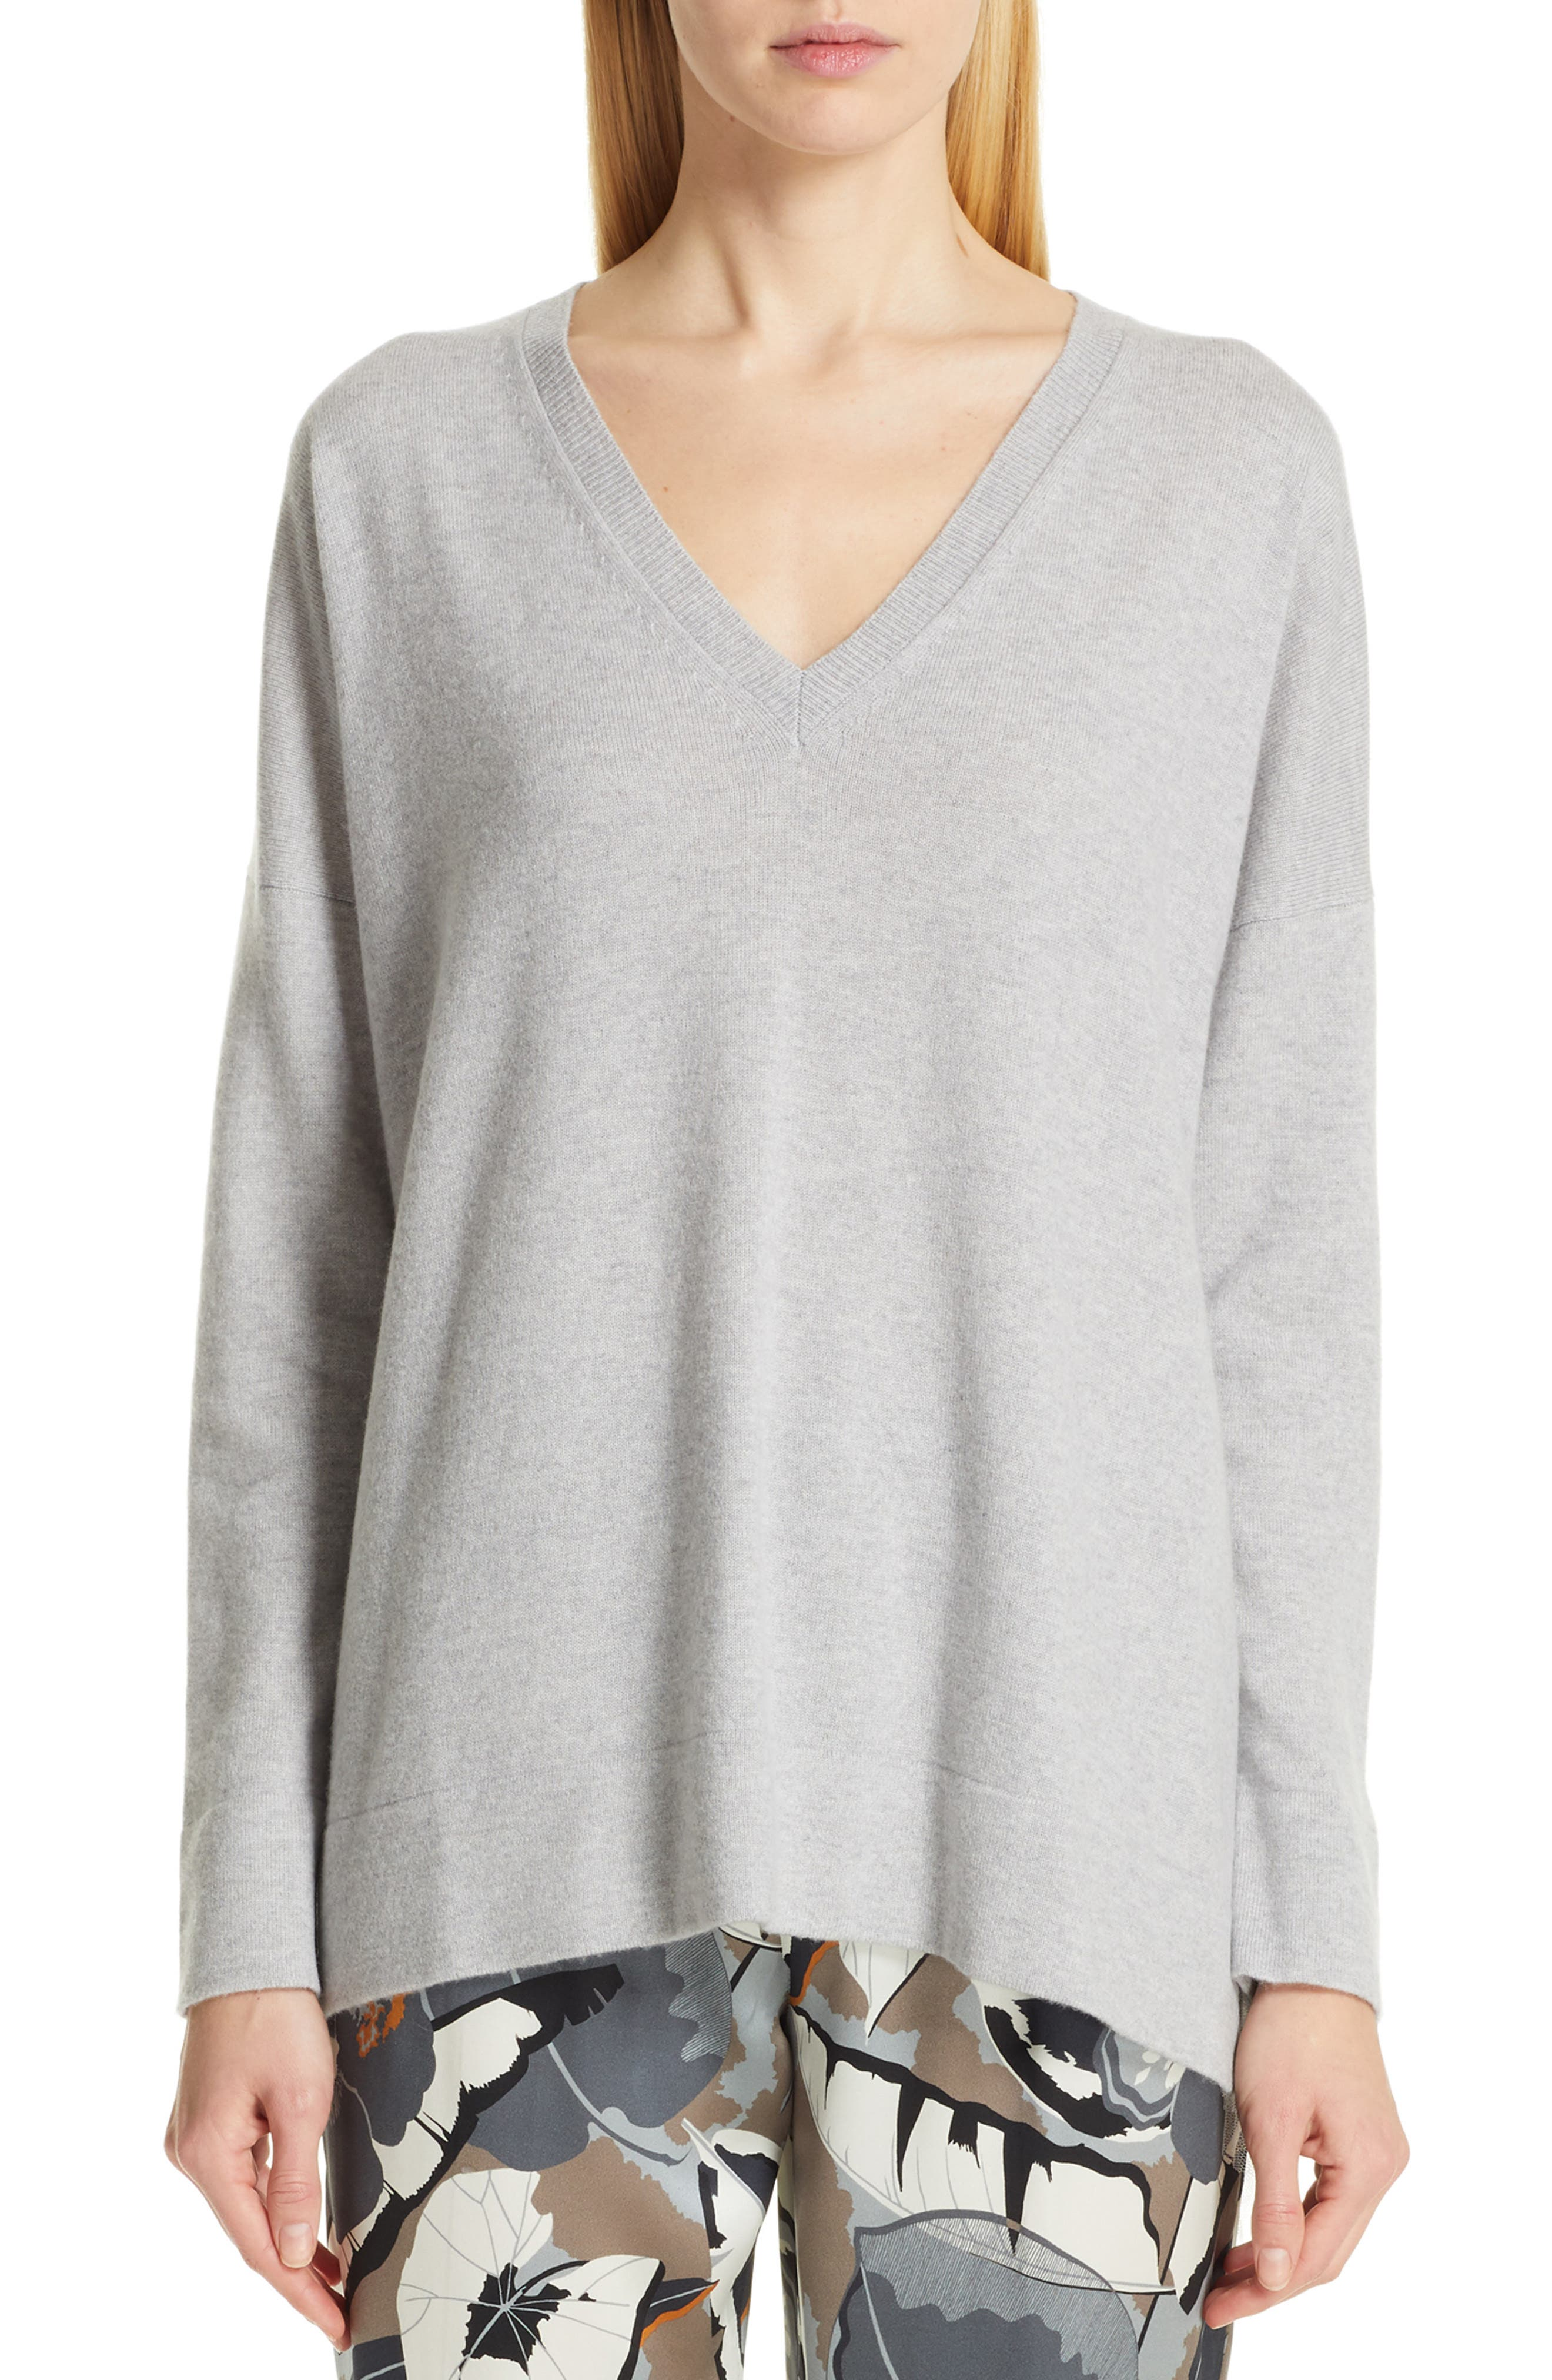 FABIANA FILIPPI Tulle Inset Cashmere Sweater, Main, color, GREY